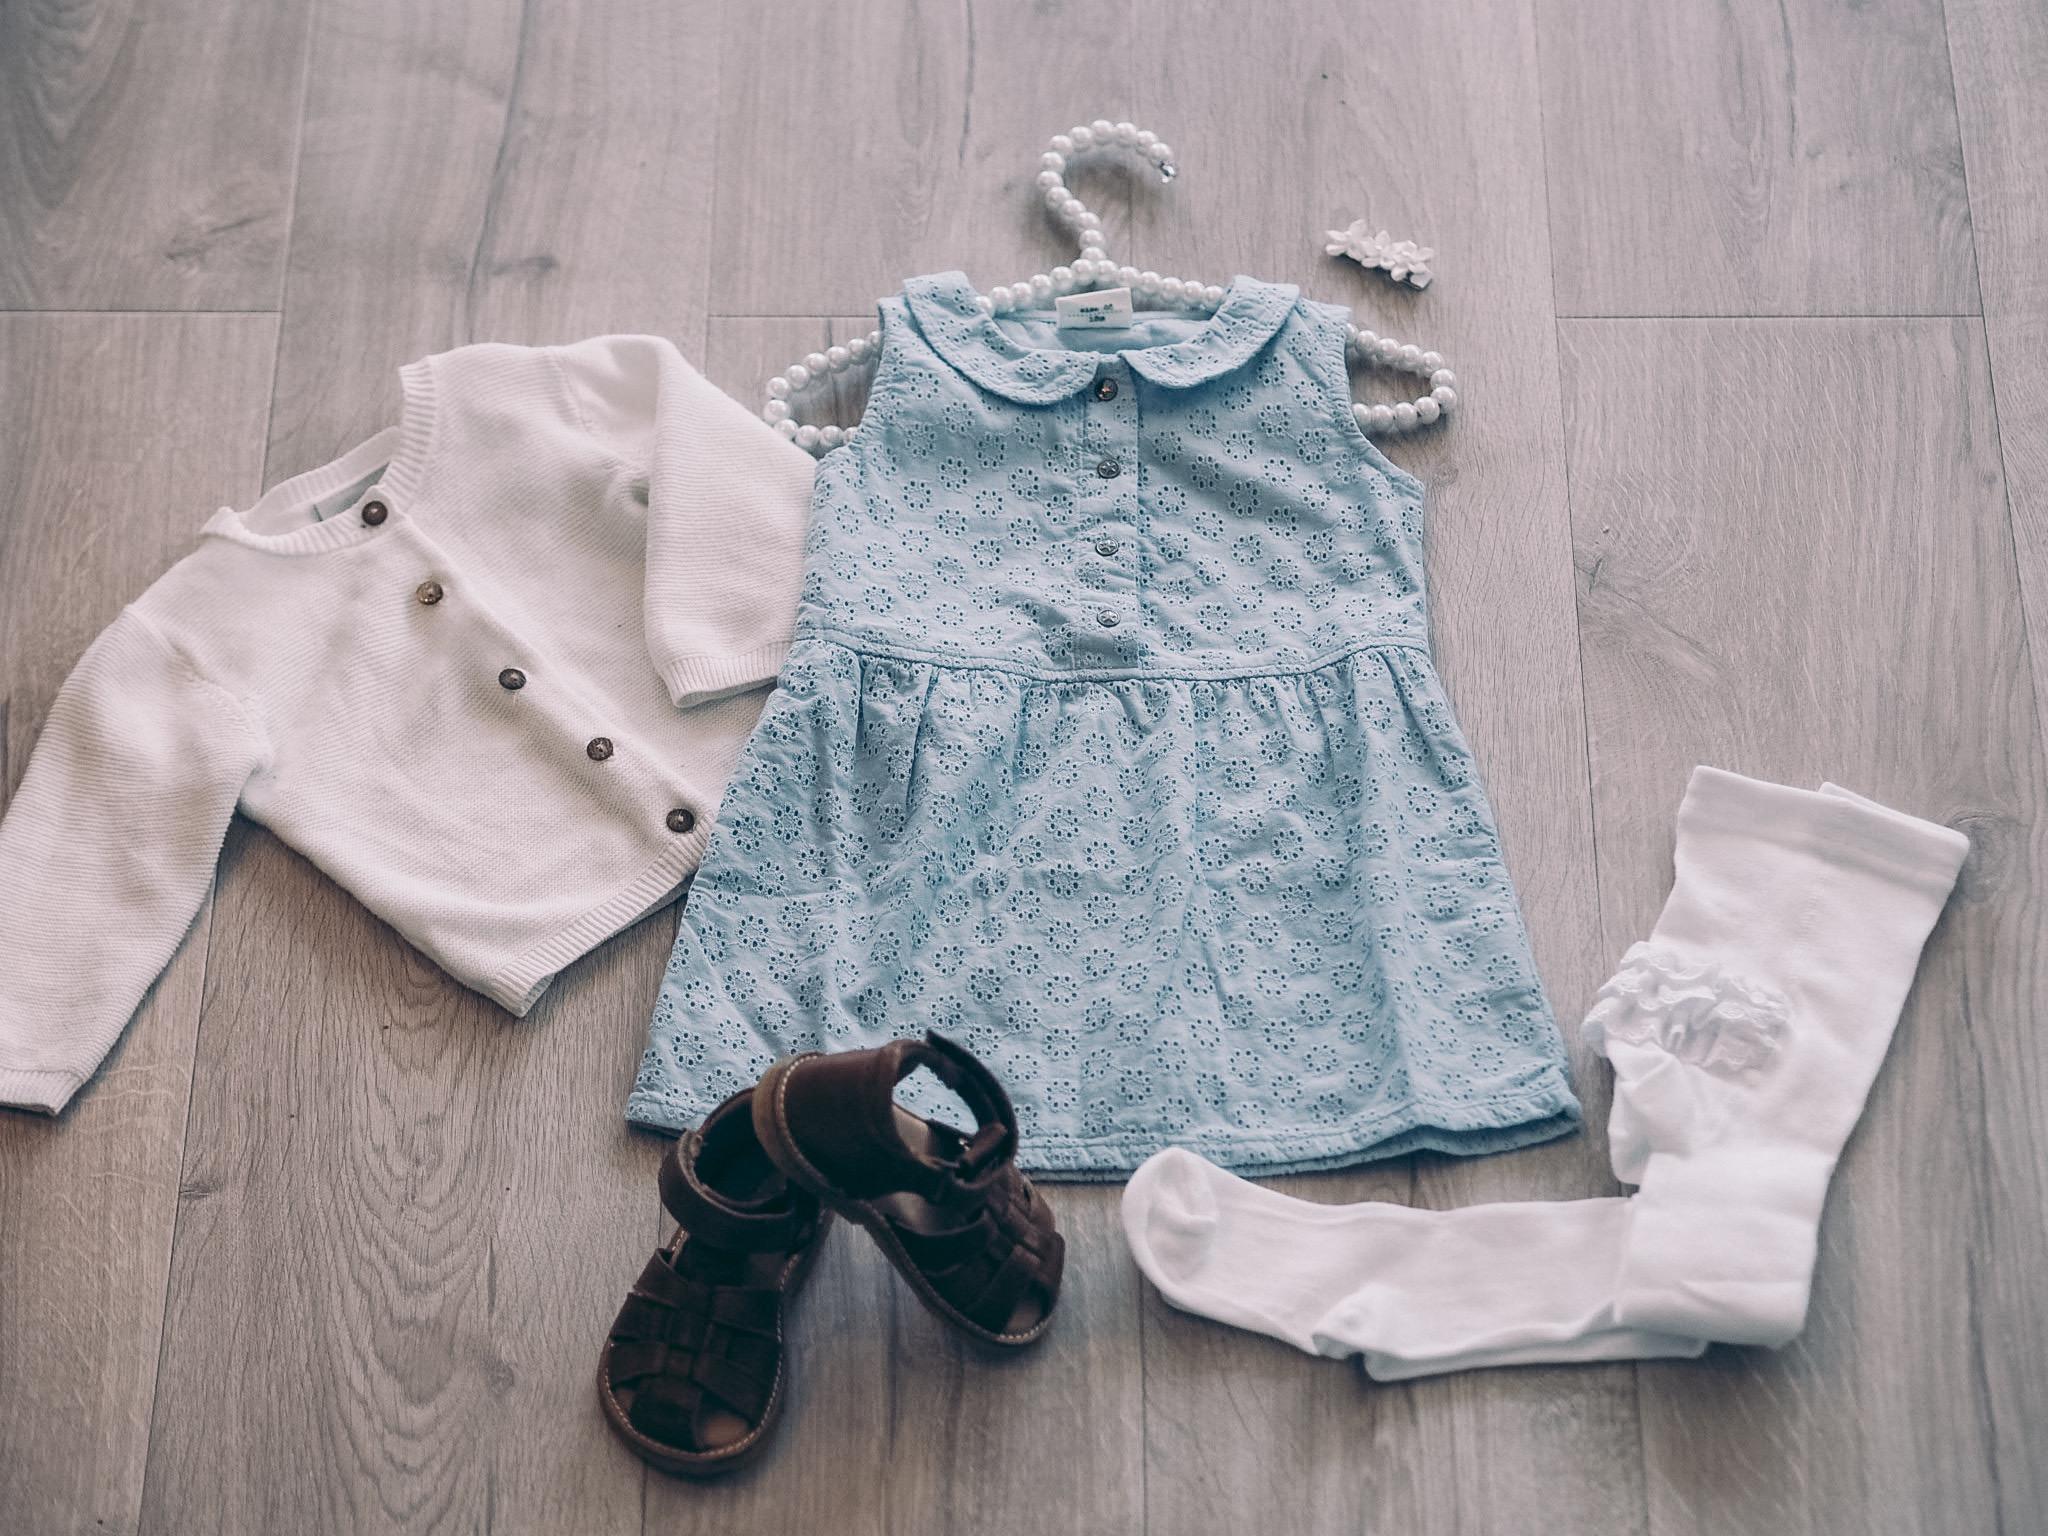 kjole, Enfant, sandaler Cognac Bisgaard, kleshenger med perler